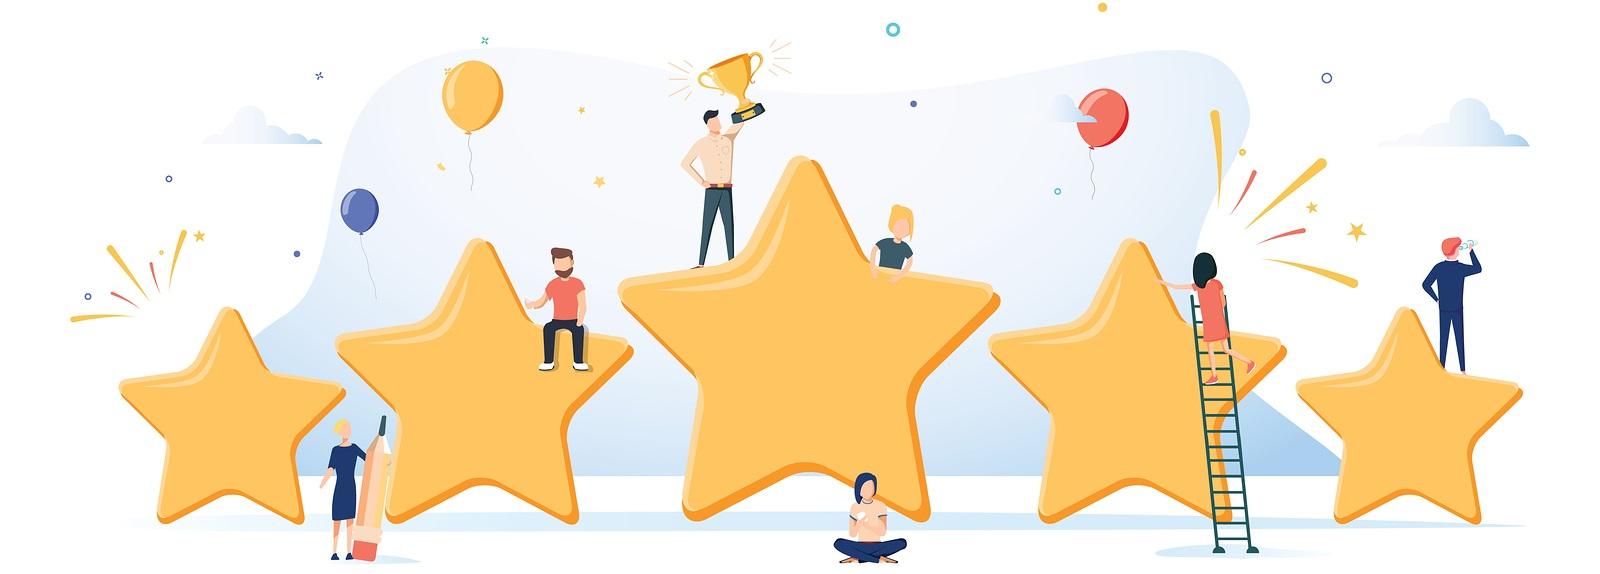 collect feedbacks and rating